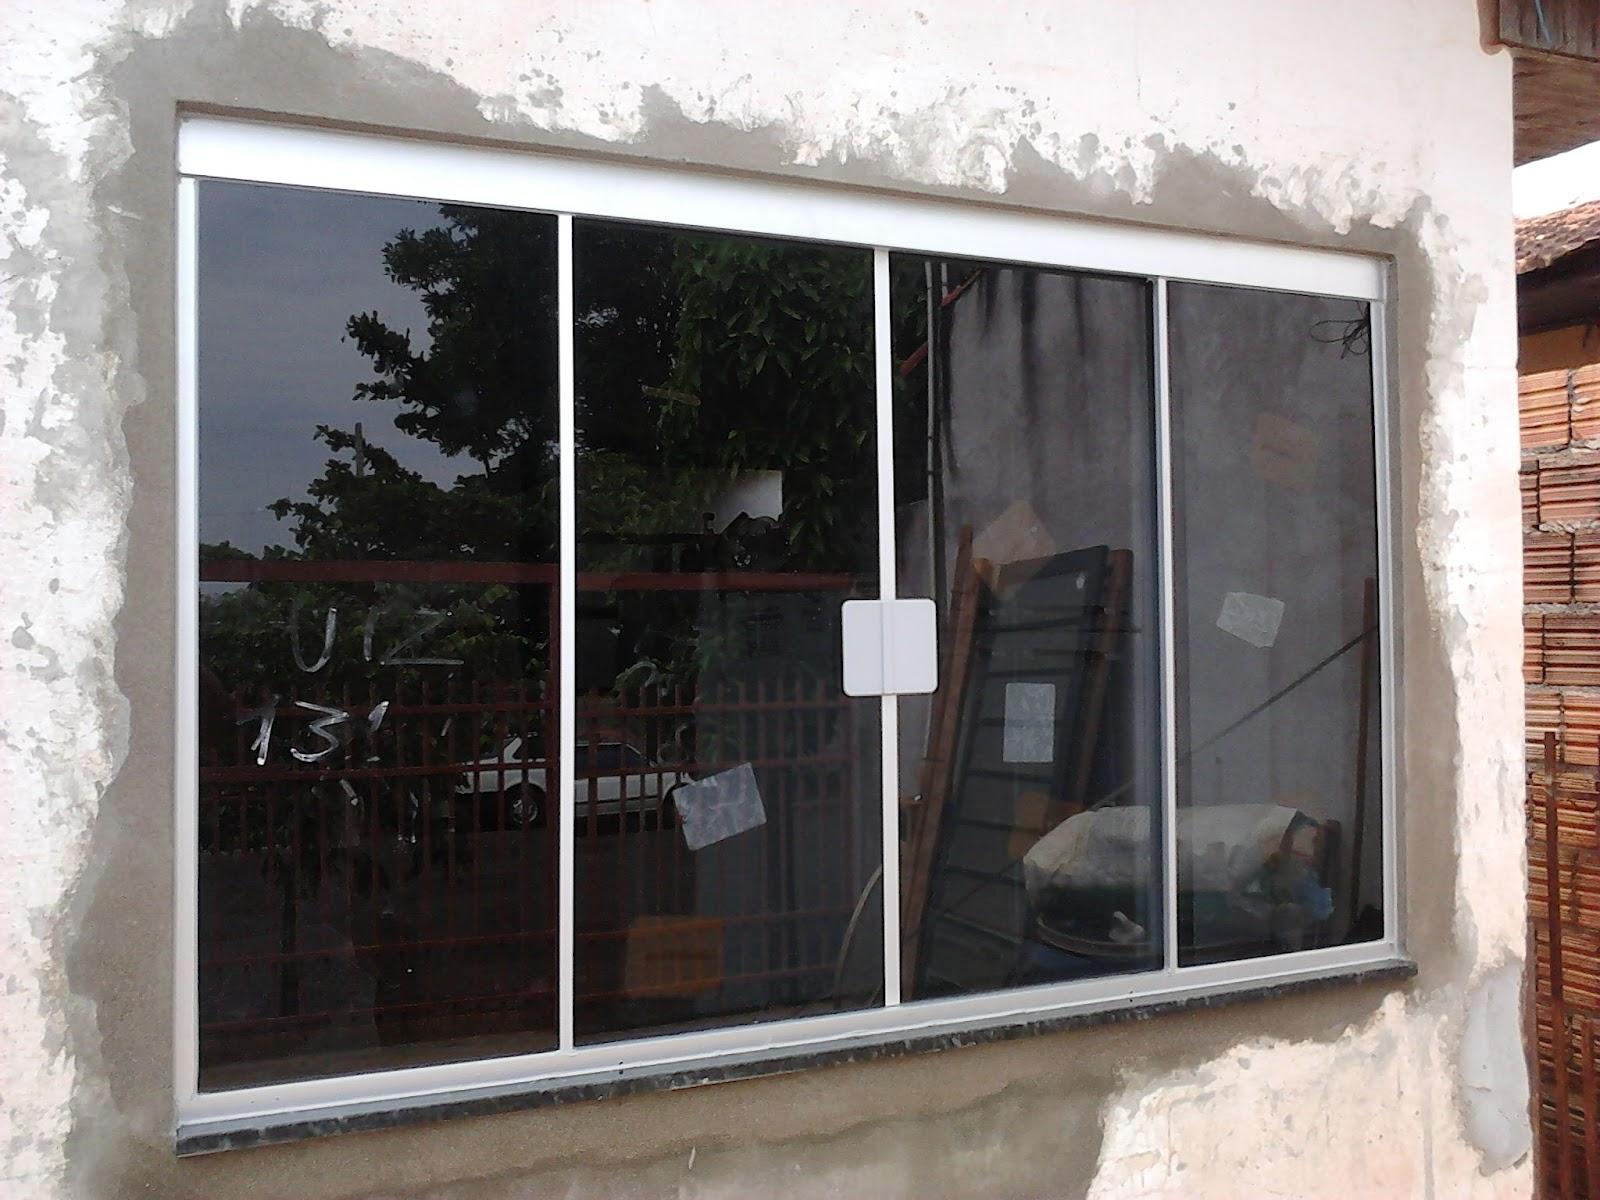 #684437 FRANCO VIDROS TEMPERADOS: Outubro 2012 200 Janelas De Vidro No Abc